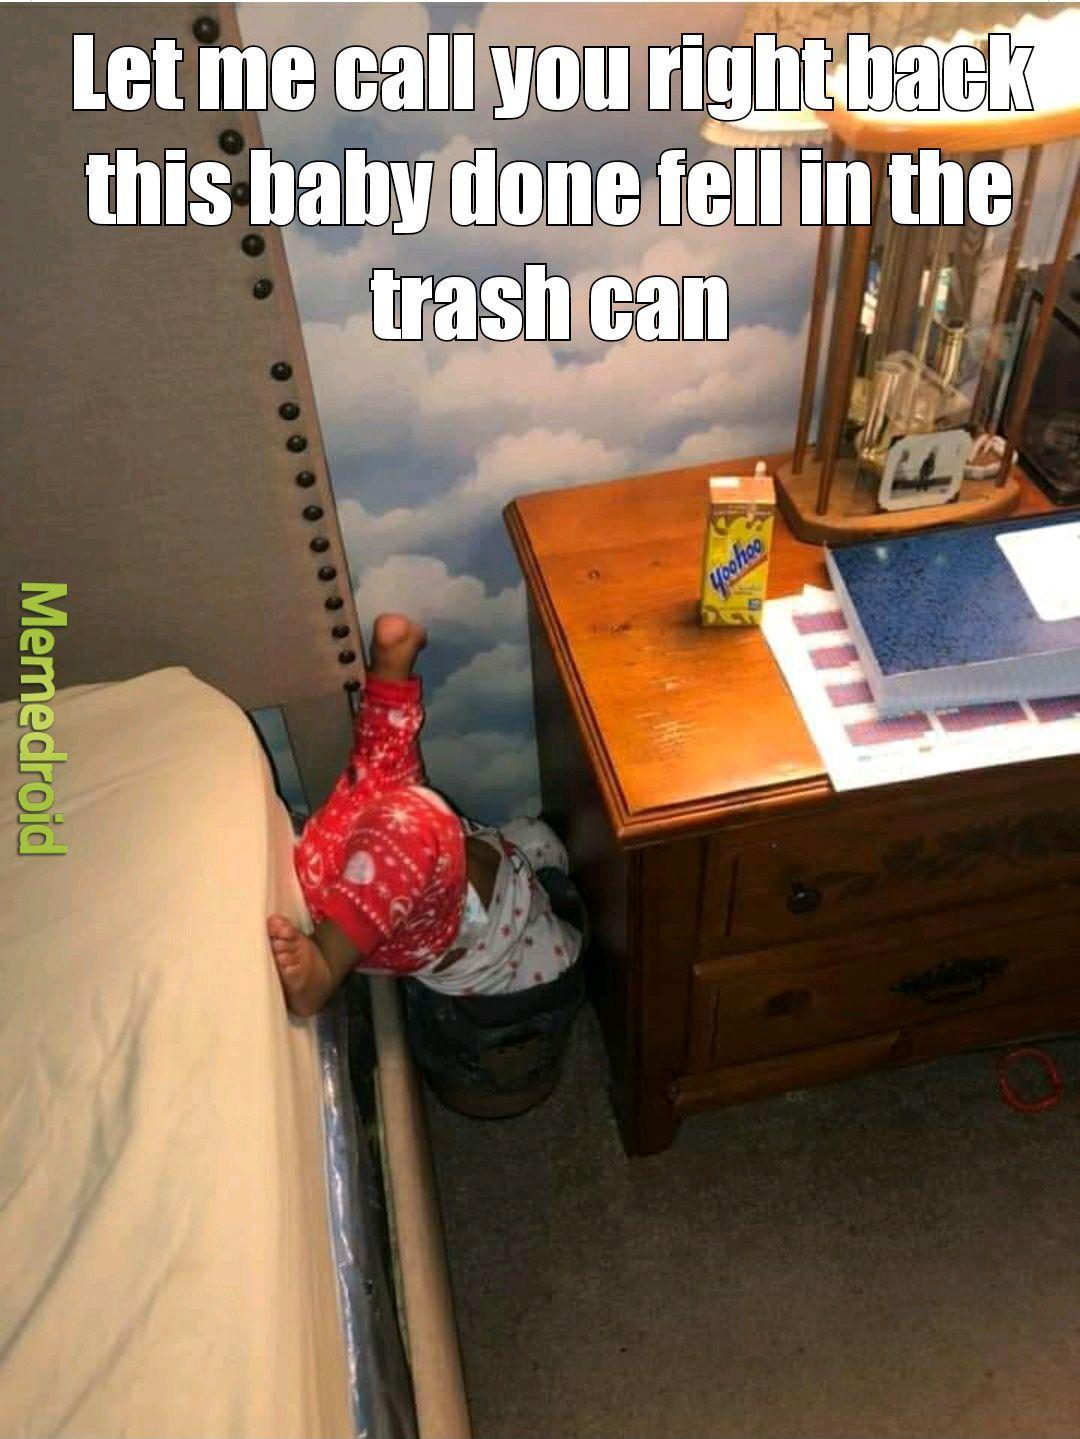 Baby's broke. Gotta get a new one. - meme